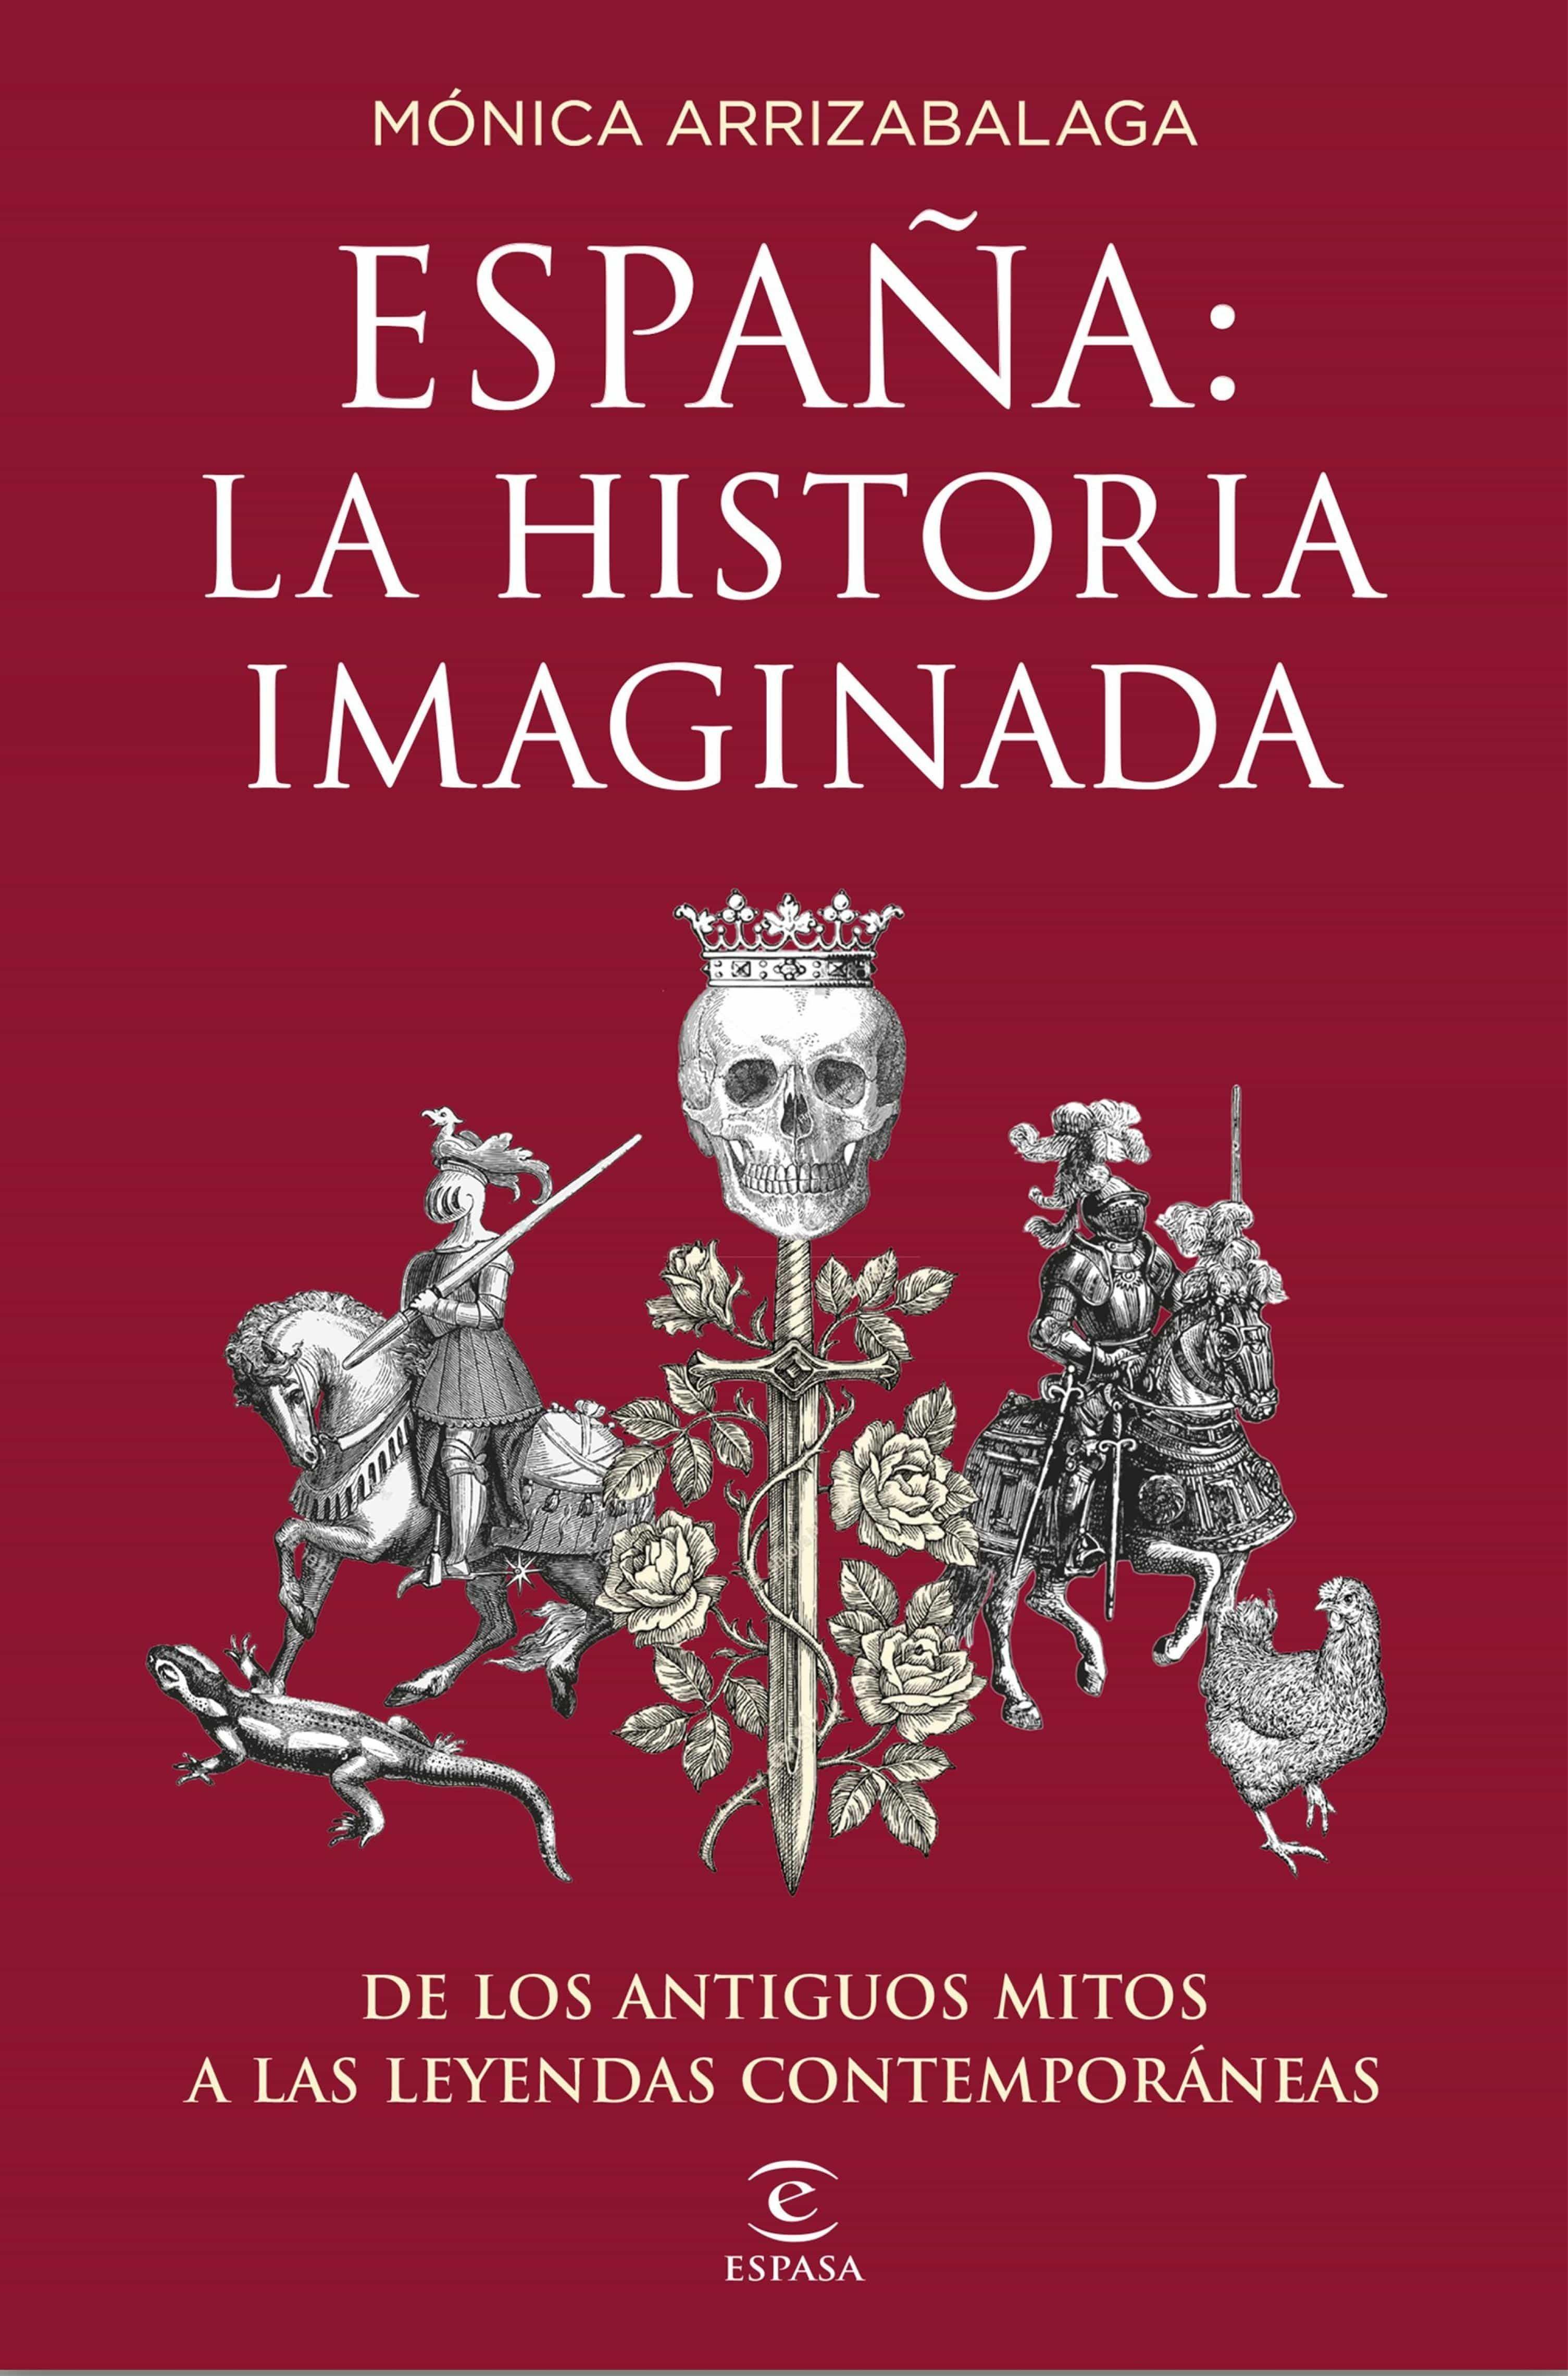 España: La Historia Imaginada   por Monica Arrizabalaga